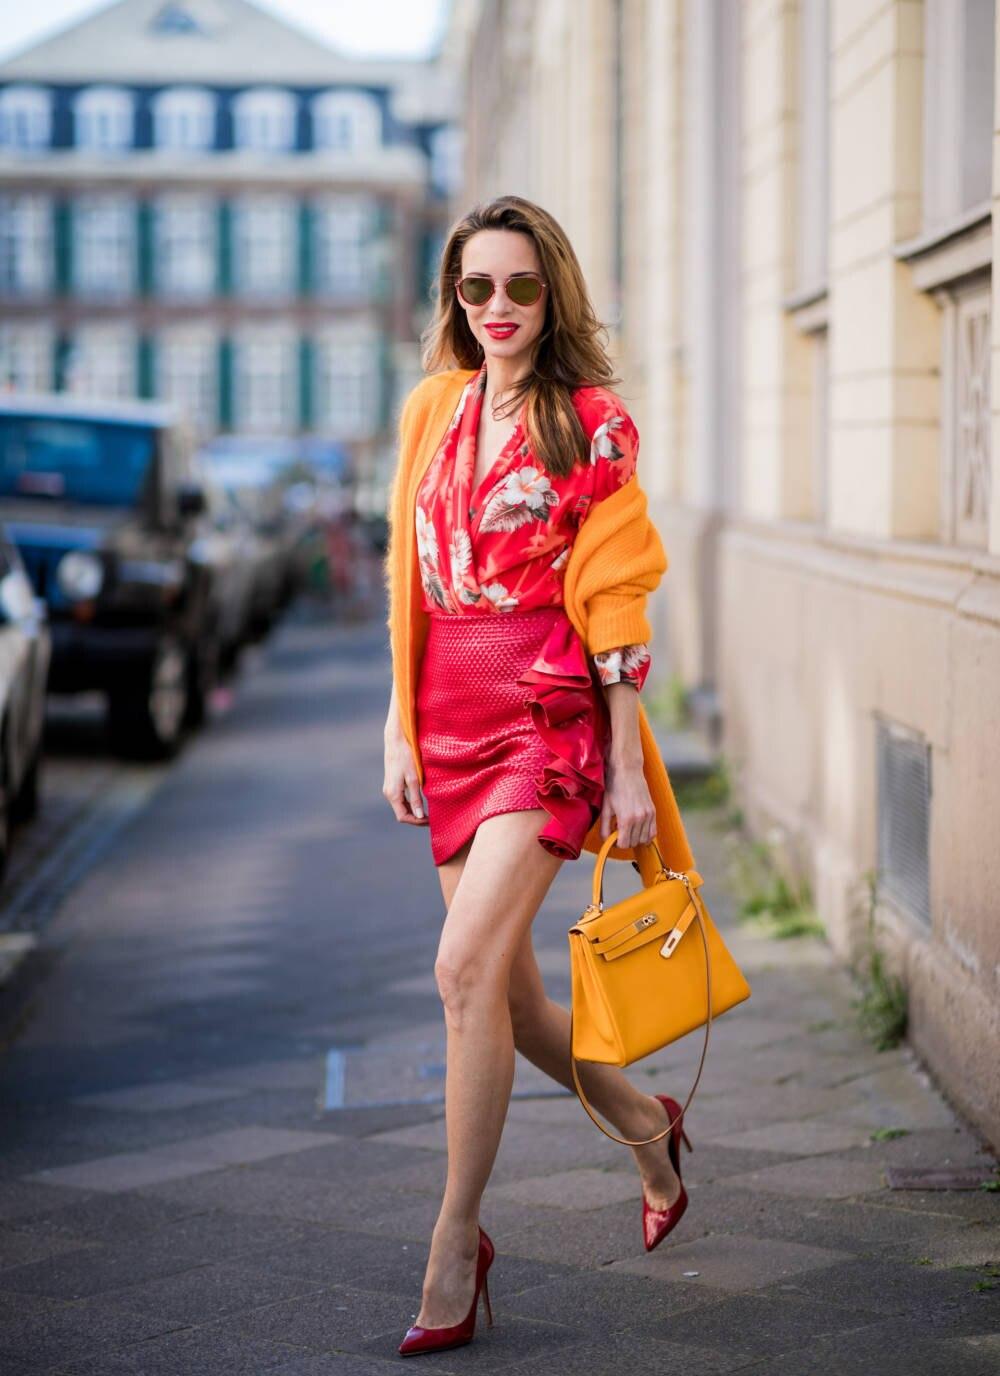 Frau trägt rotes Kleid und orangefarbene Accessoires